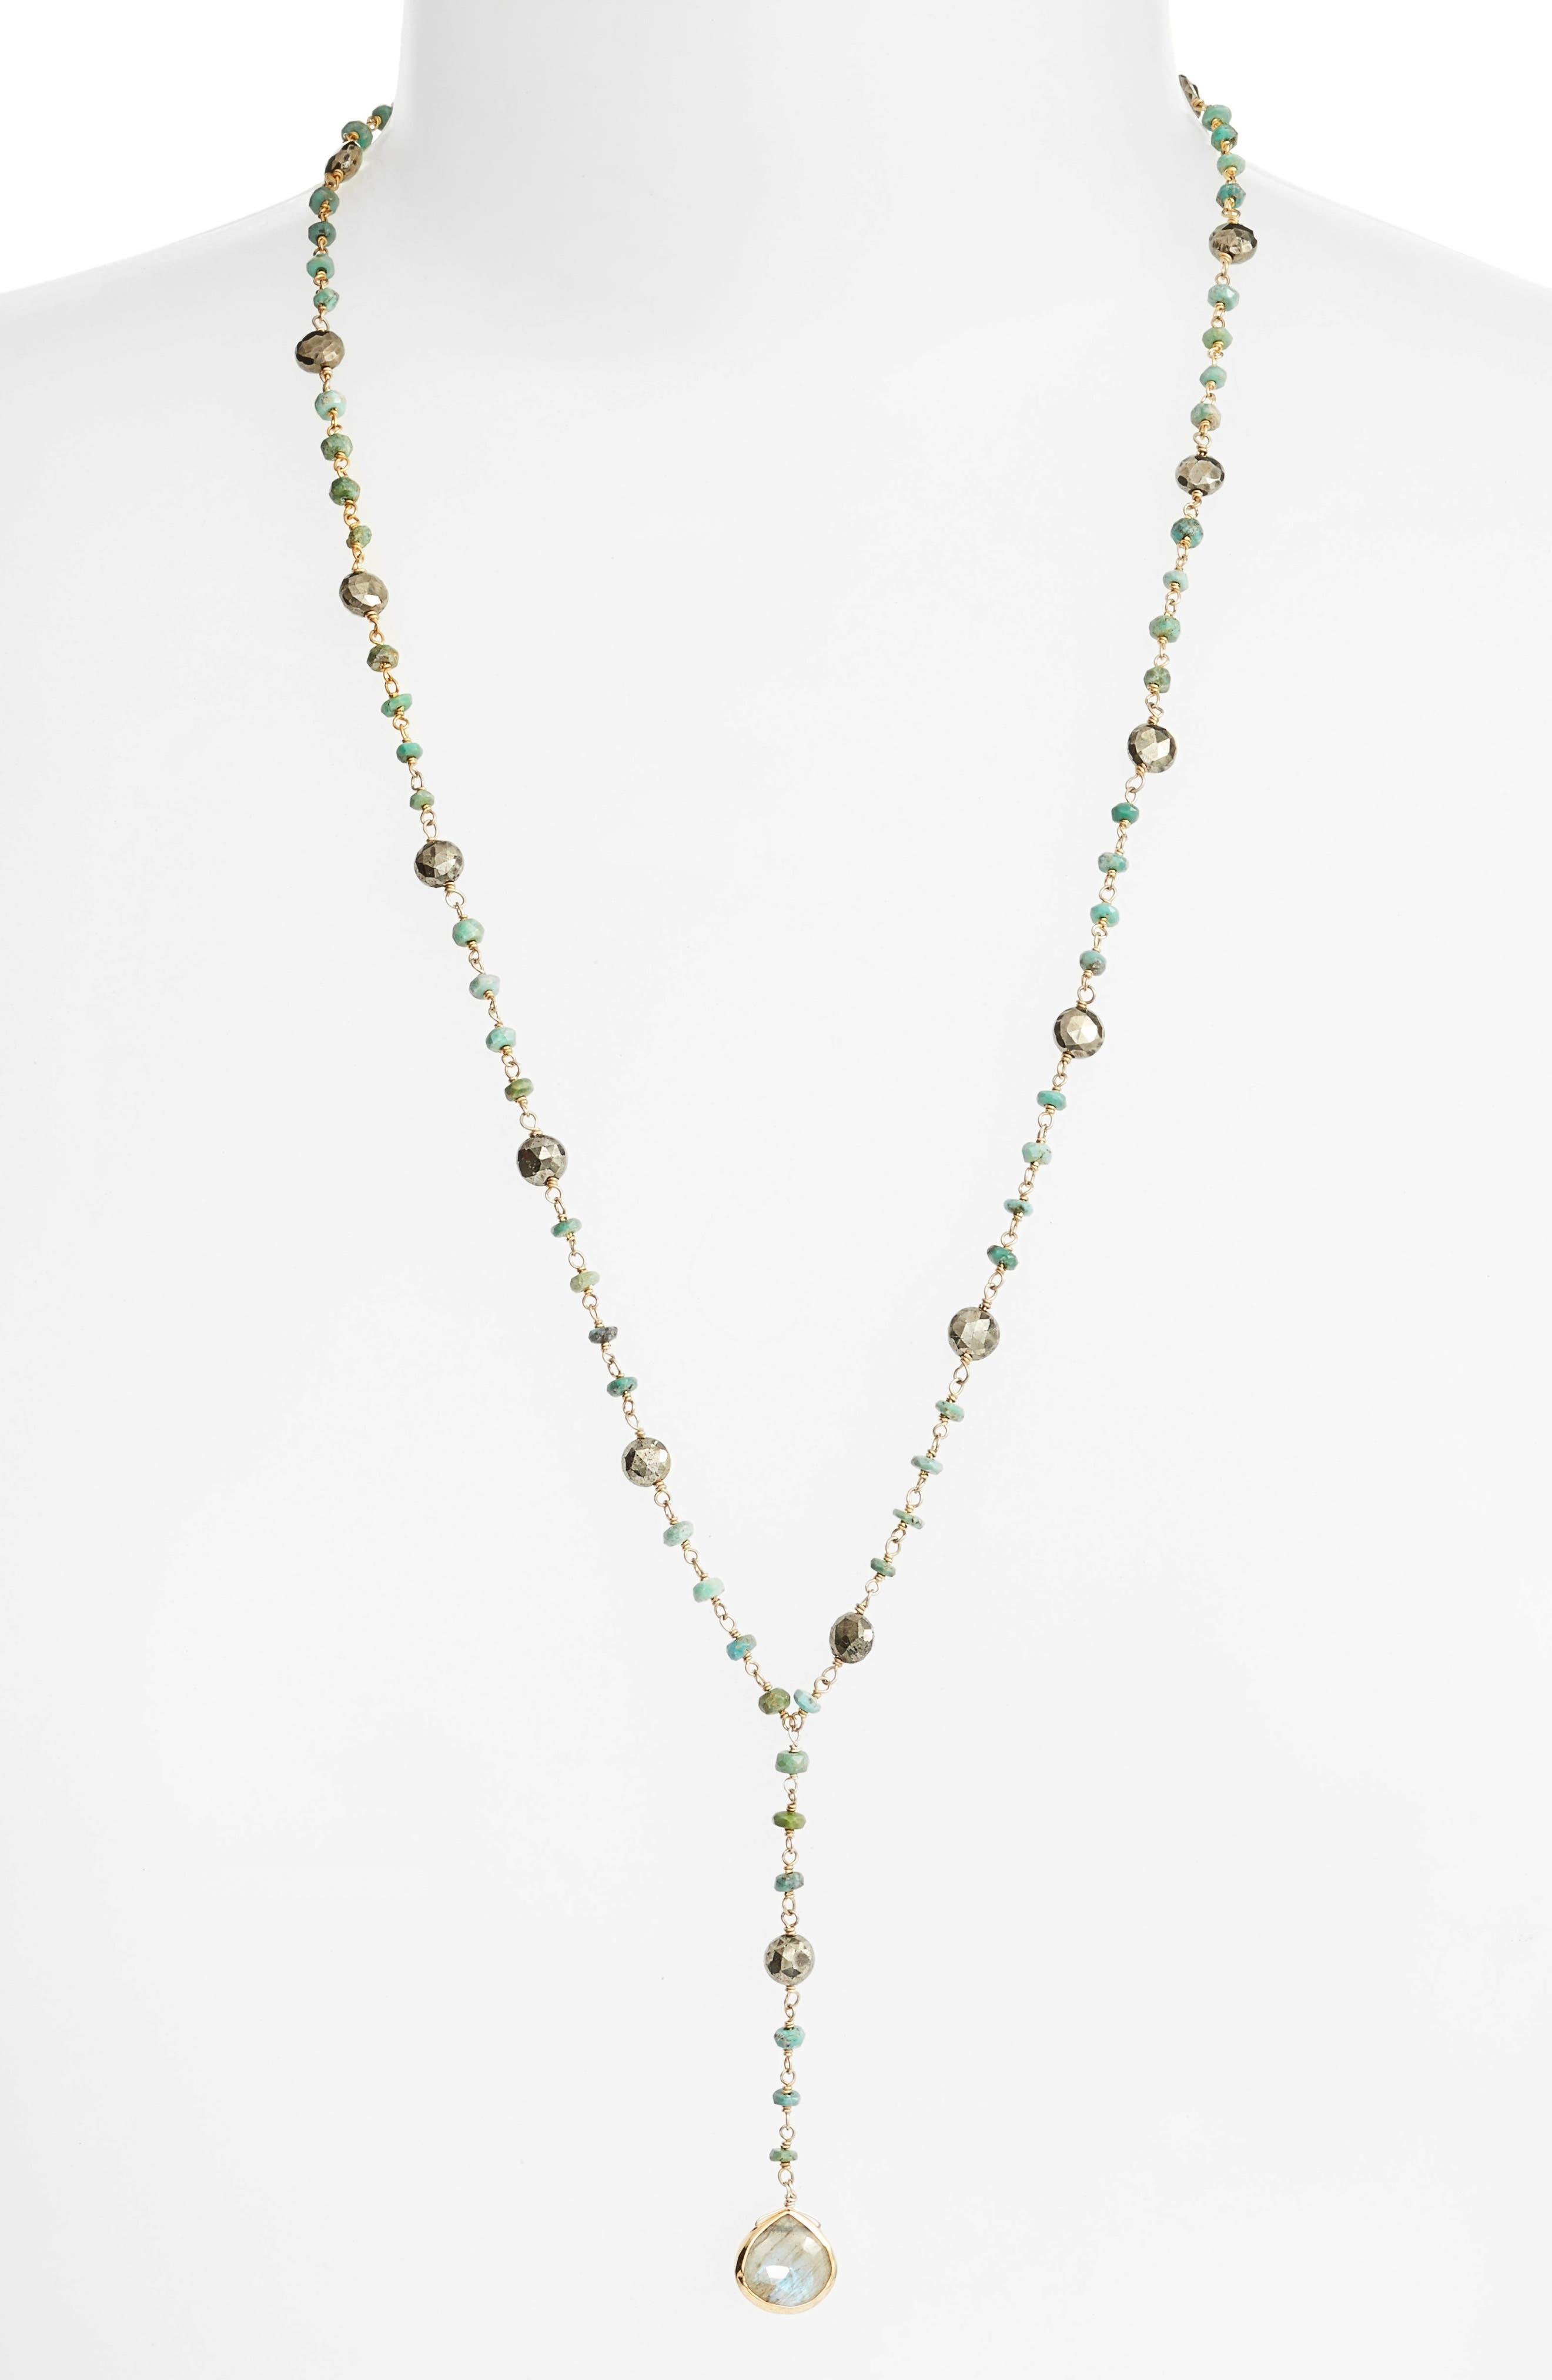 Yaeli Satellite 24 Semiprecious Stone Y-Necklace,                             Main thumbnail 1, color,                             Turquoise / Labradorite